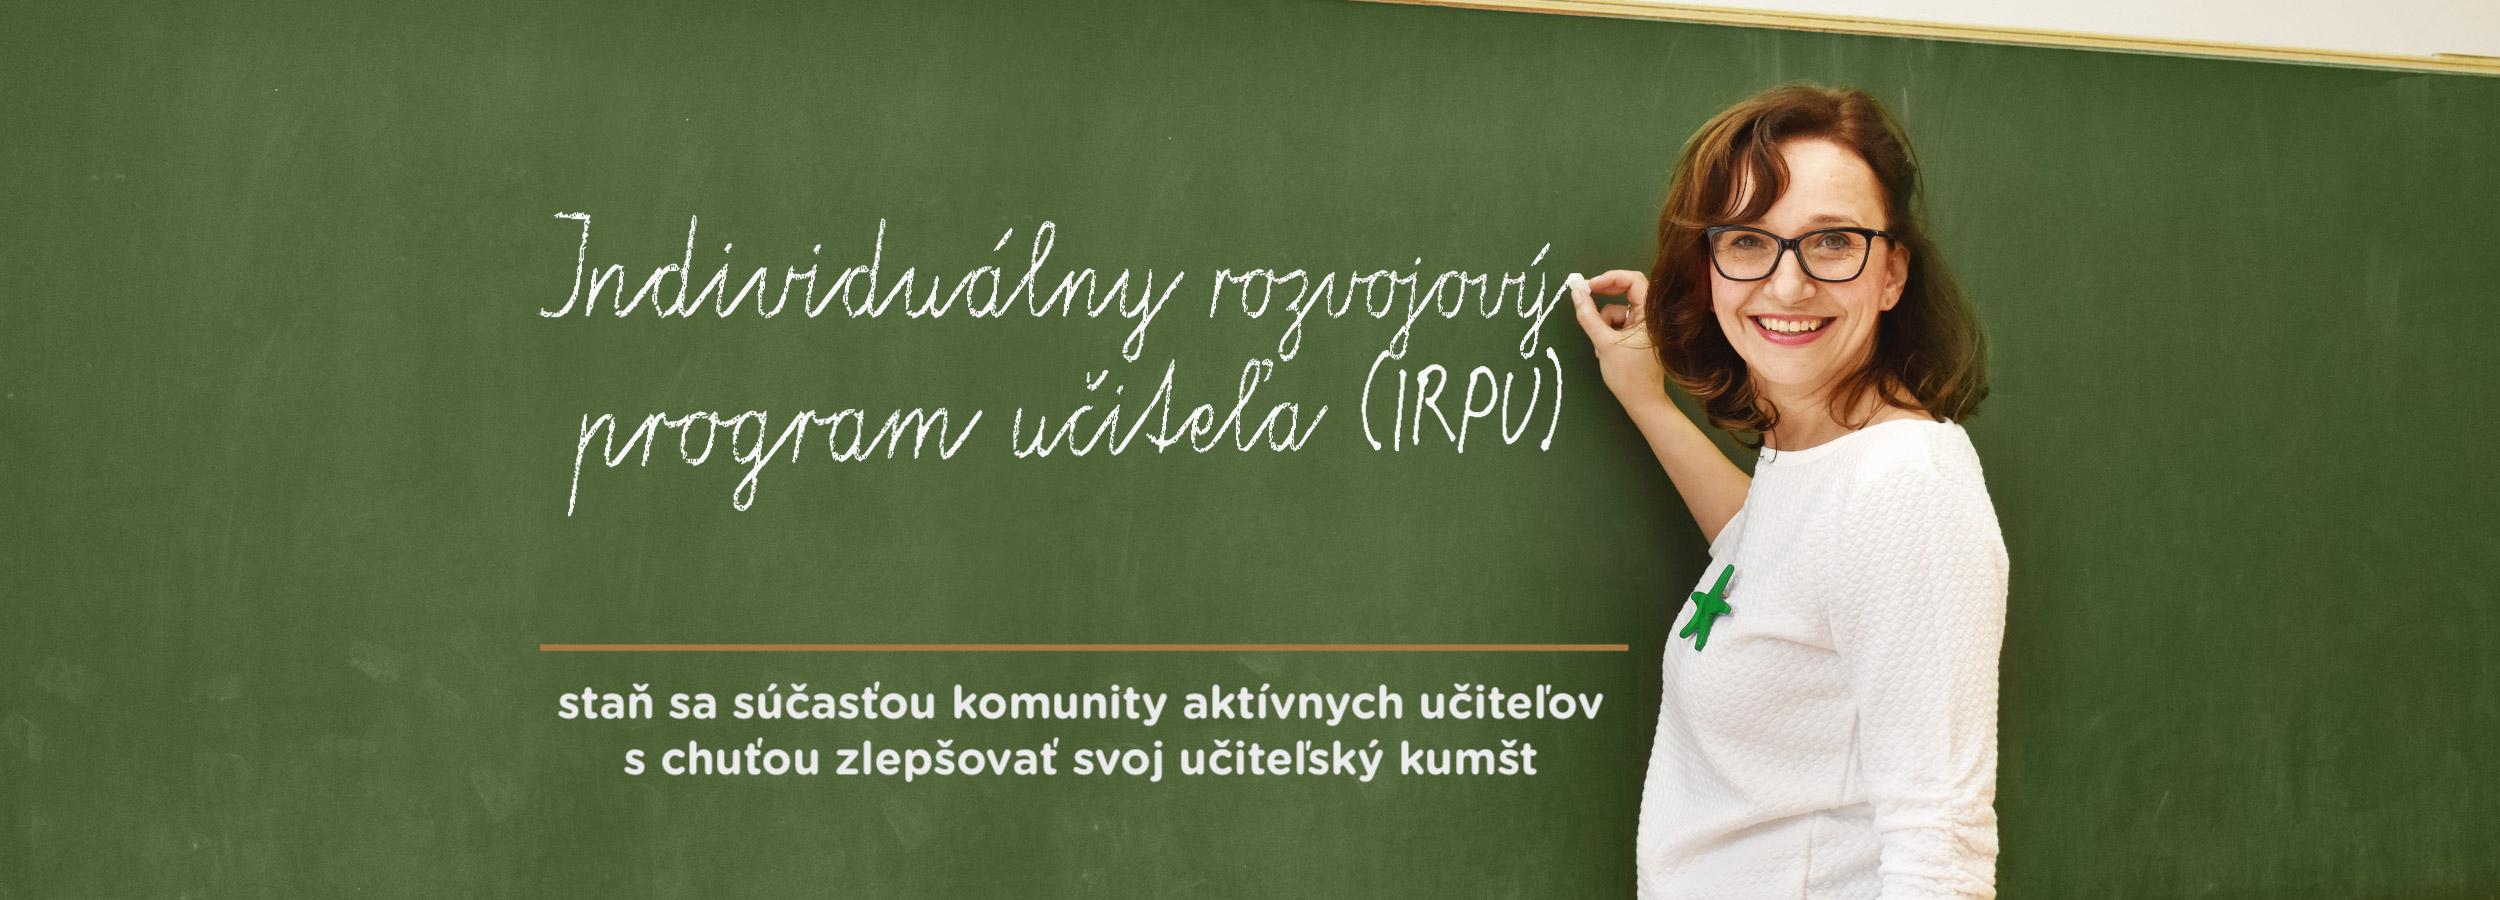 Vizual-zakladna-foto-IRPU-cista-3